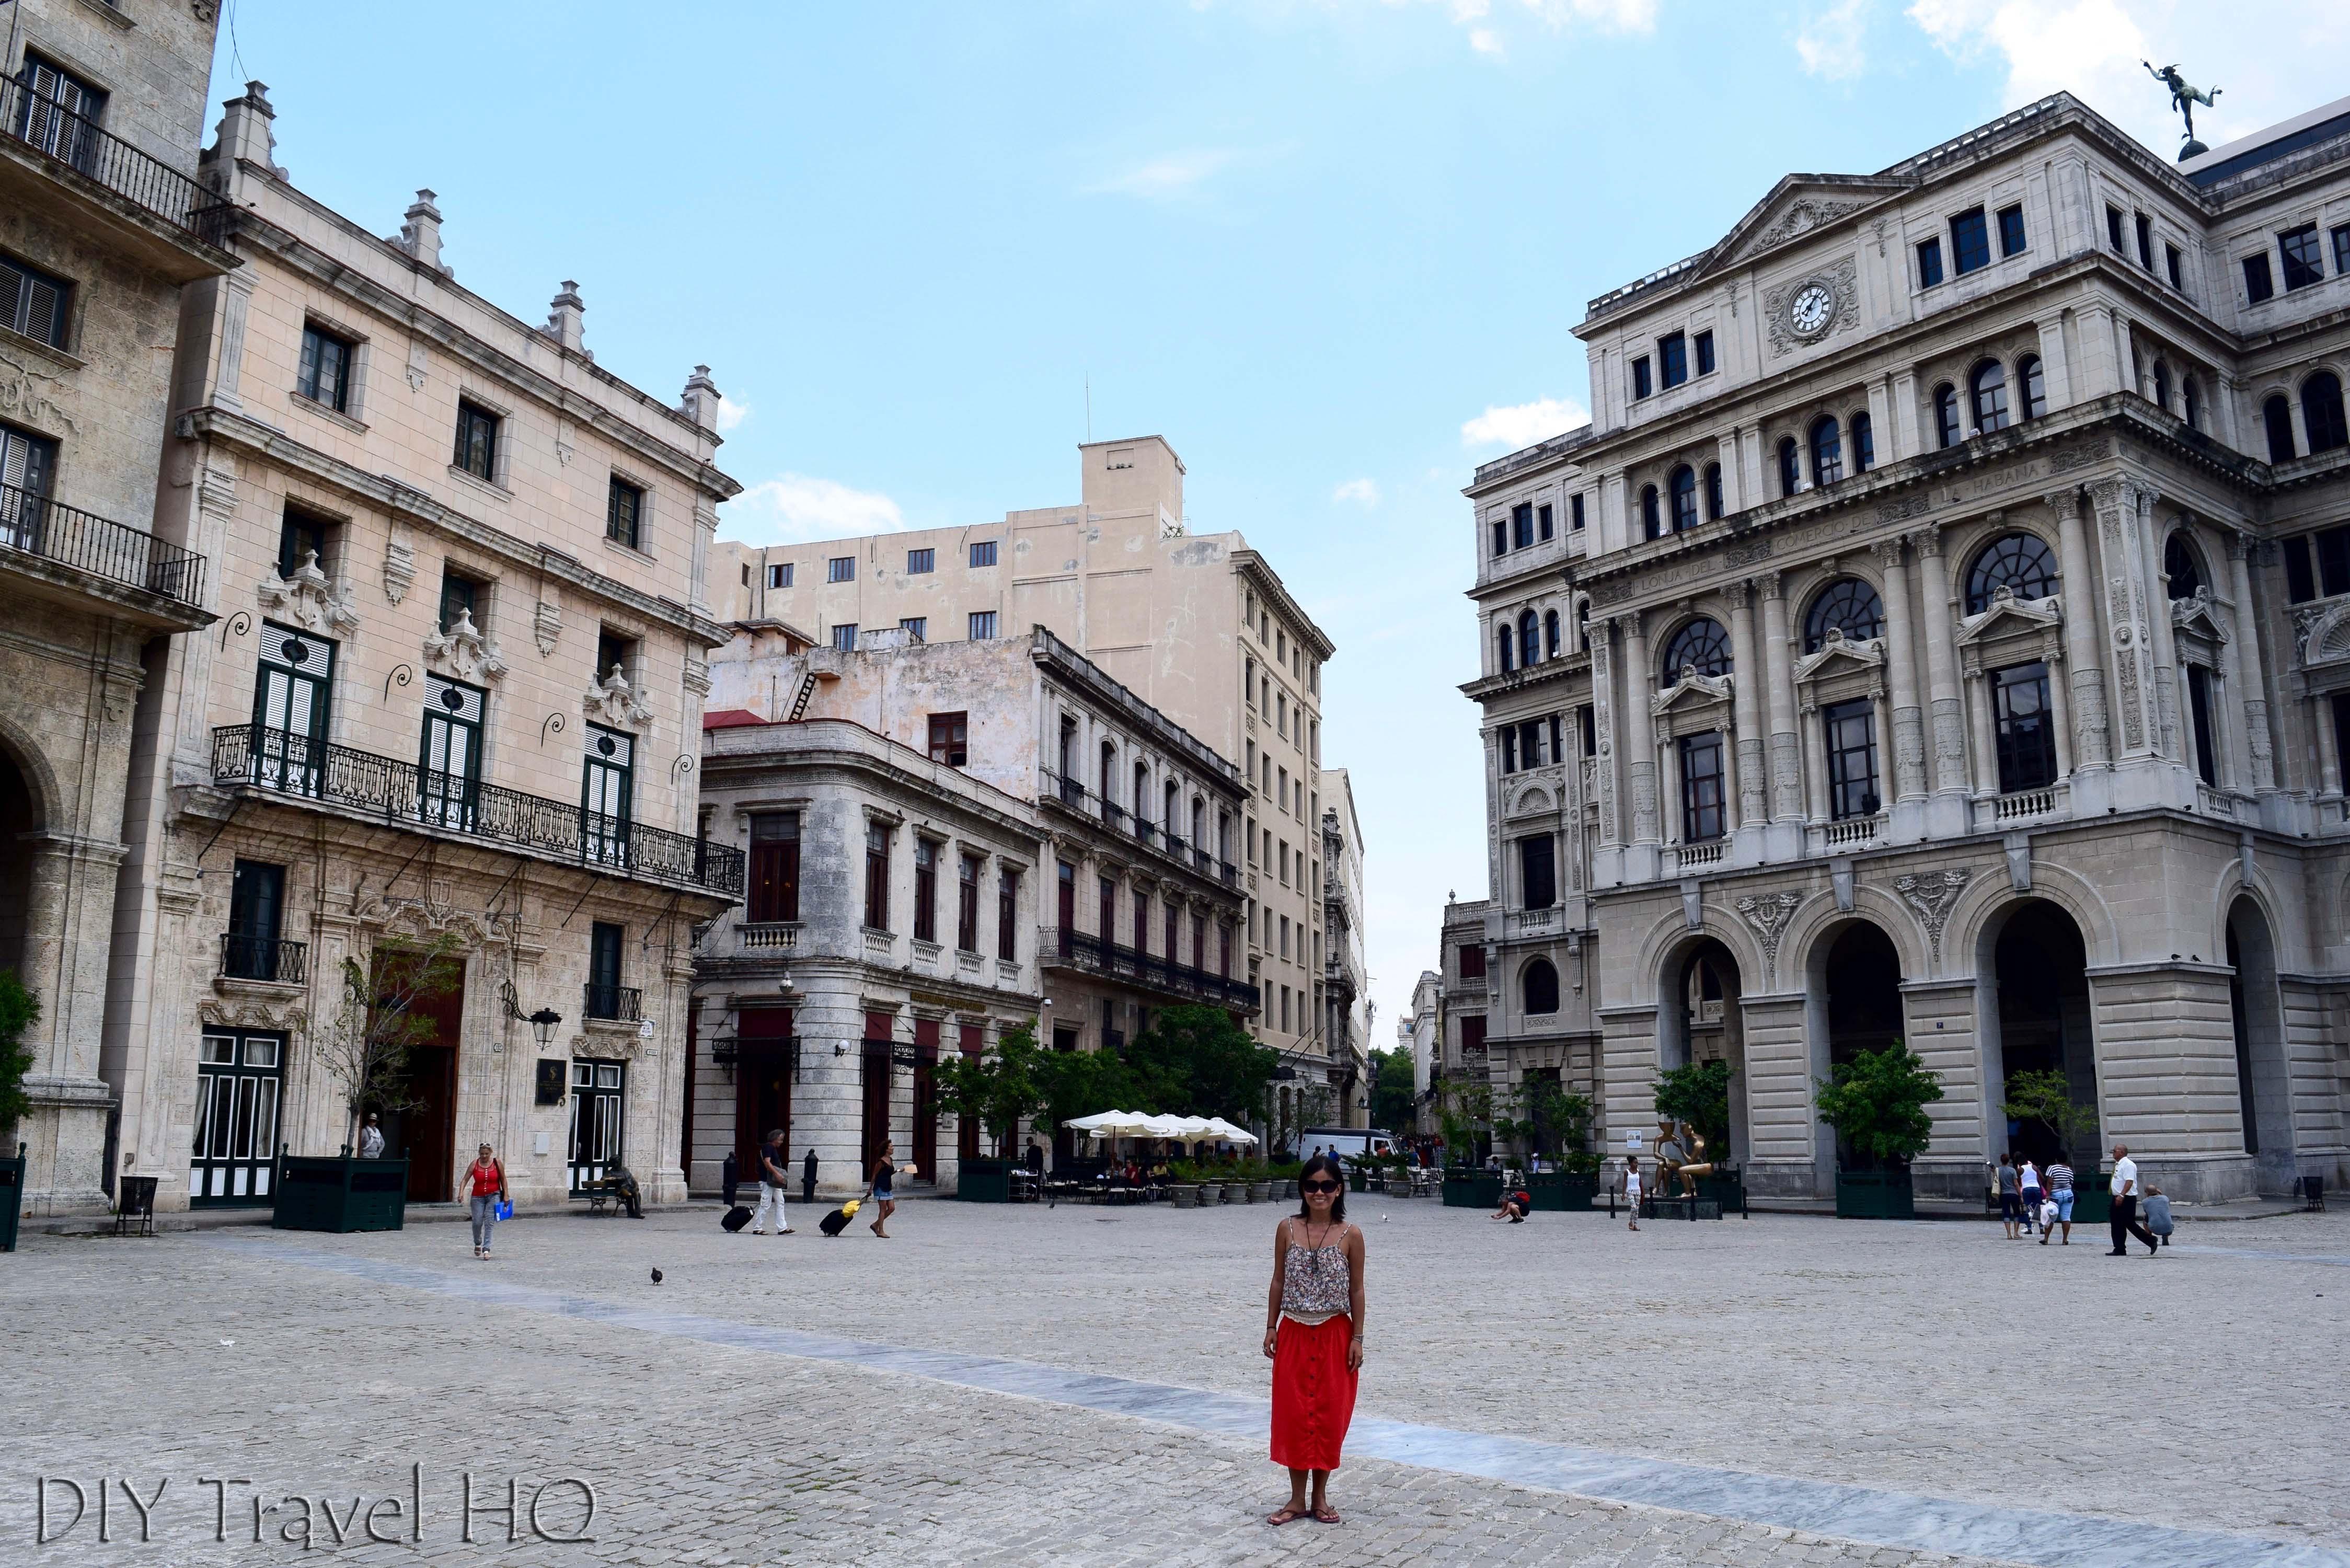 Plaza de San Francisco de Asis and Around in Old Havana DIY Travel HQ